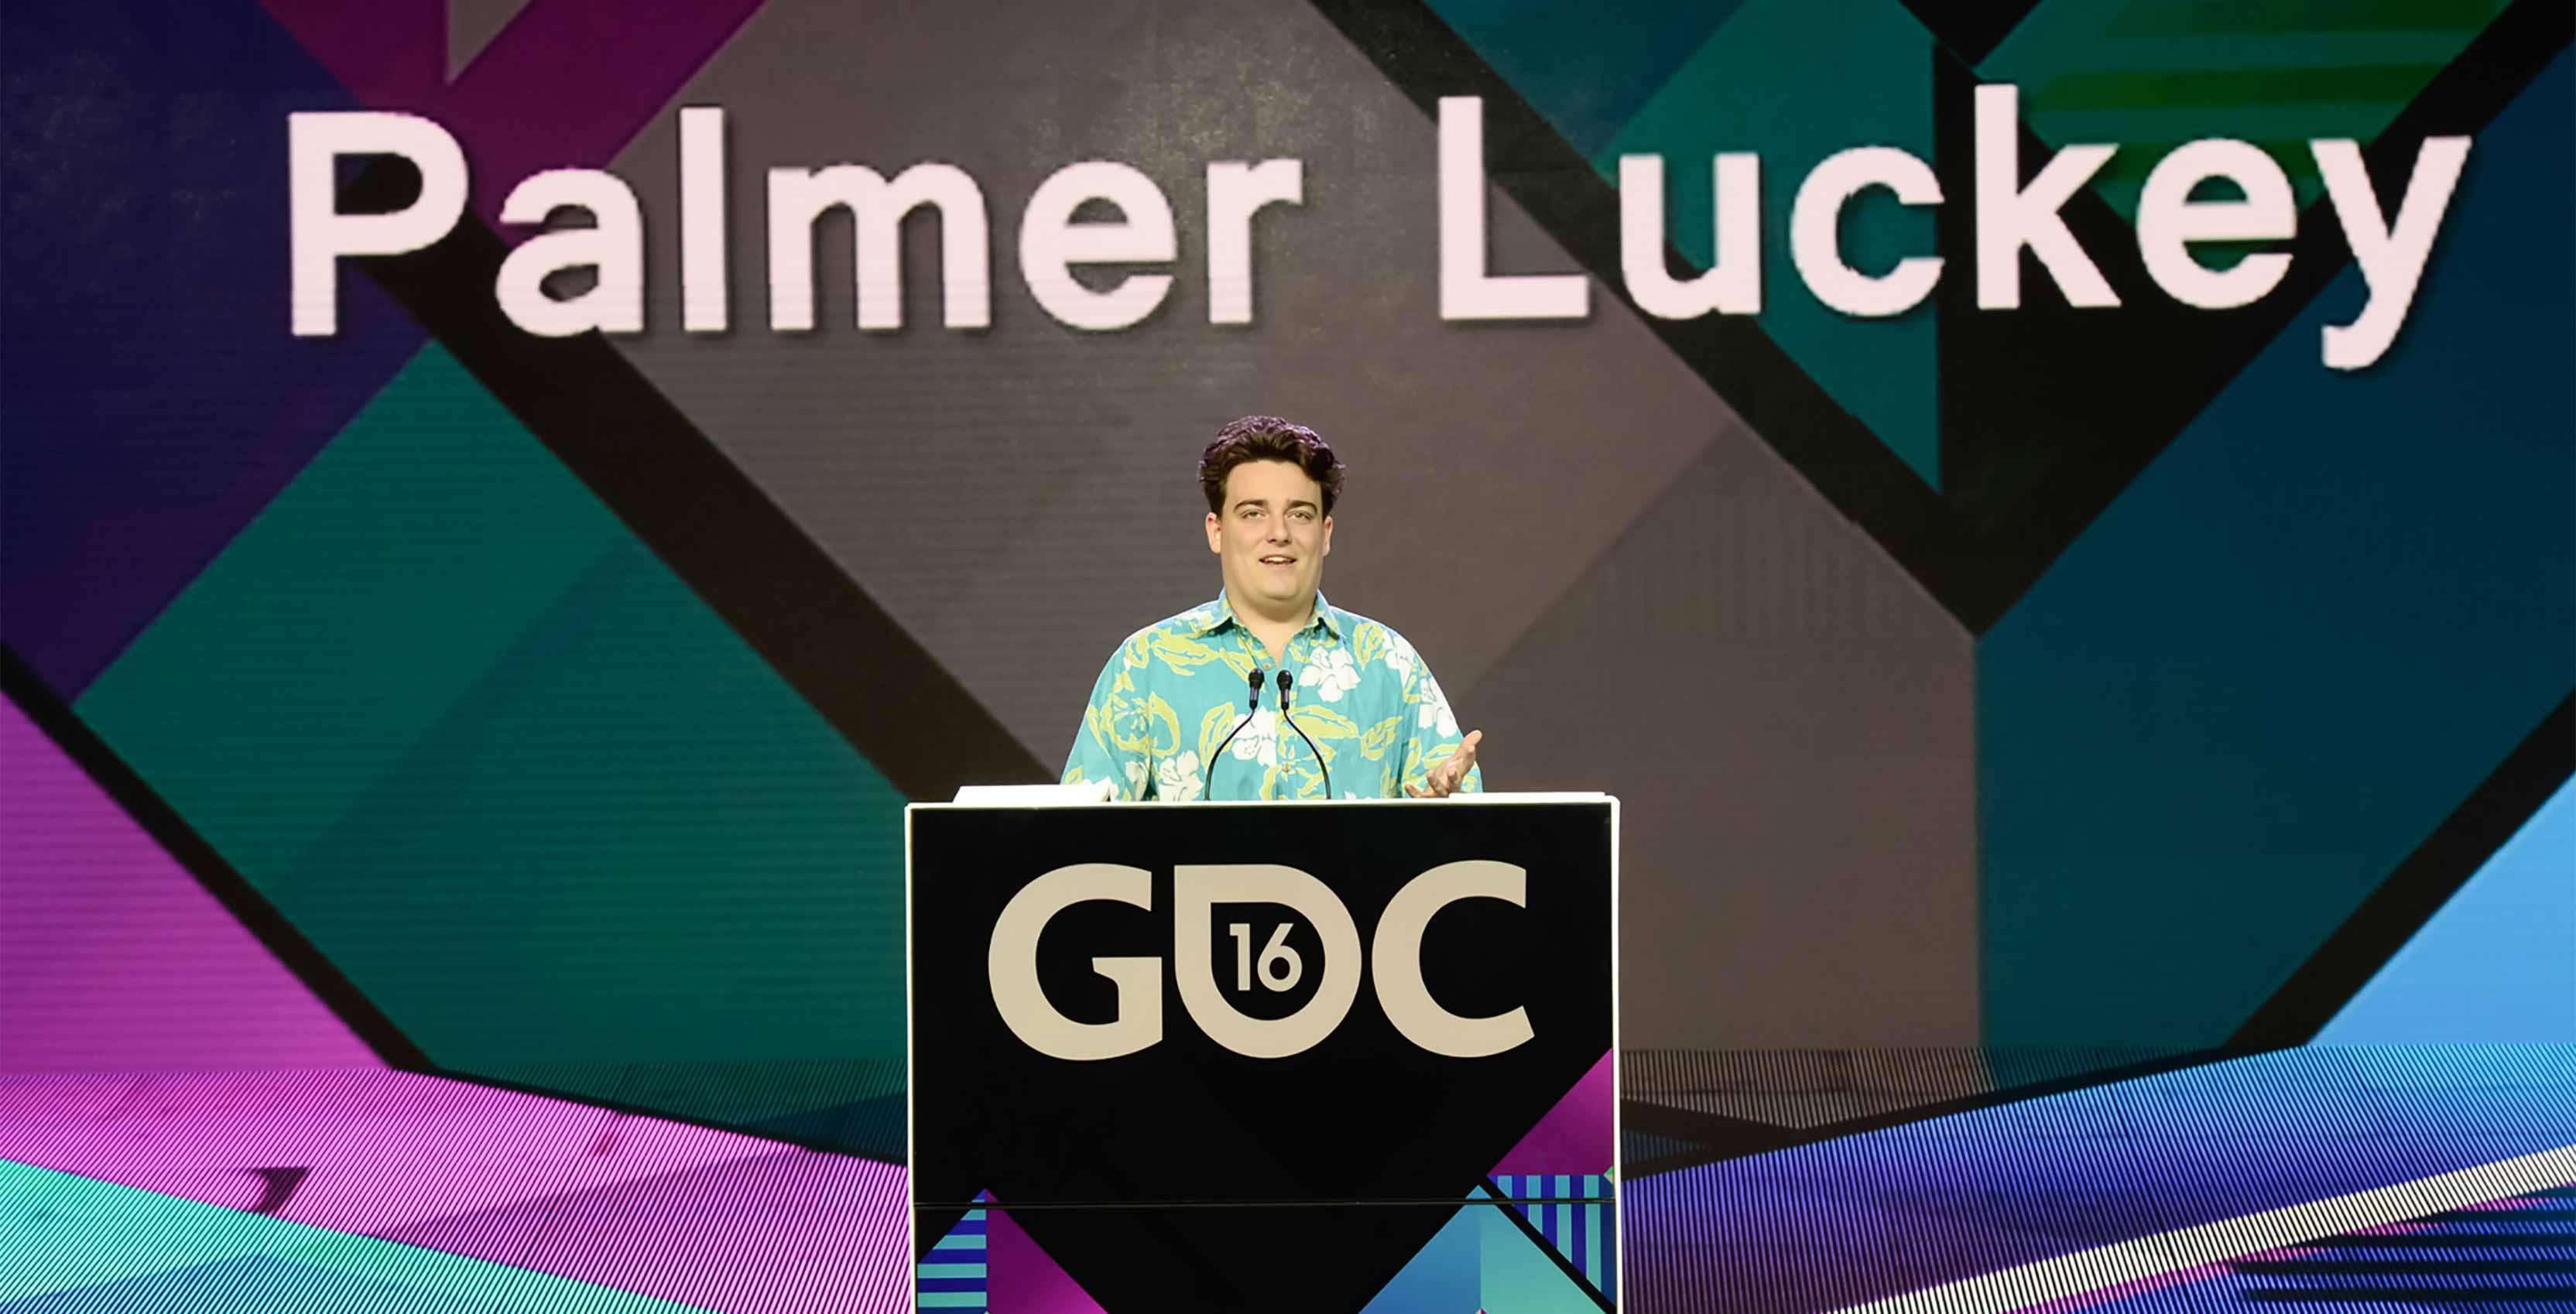 Palmer Luckey Oculus